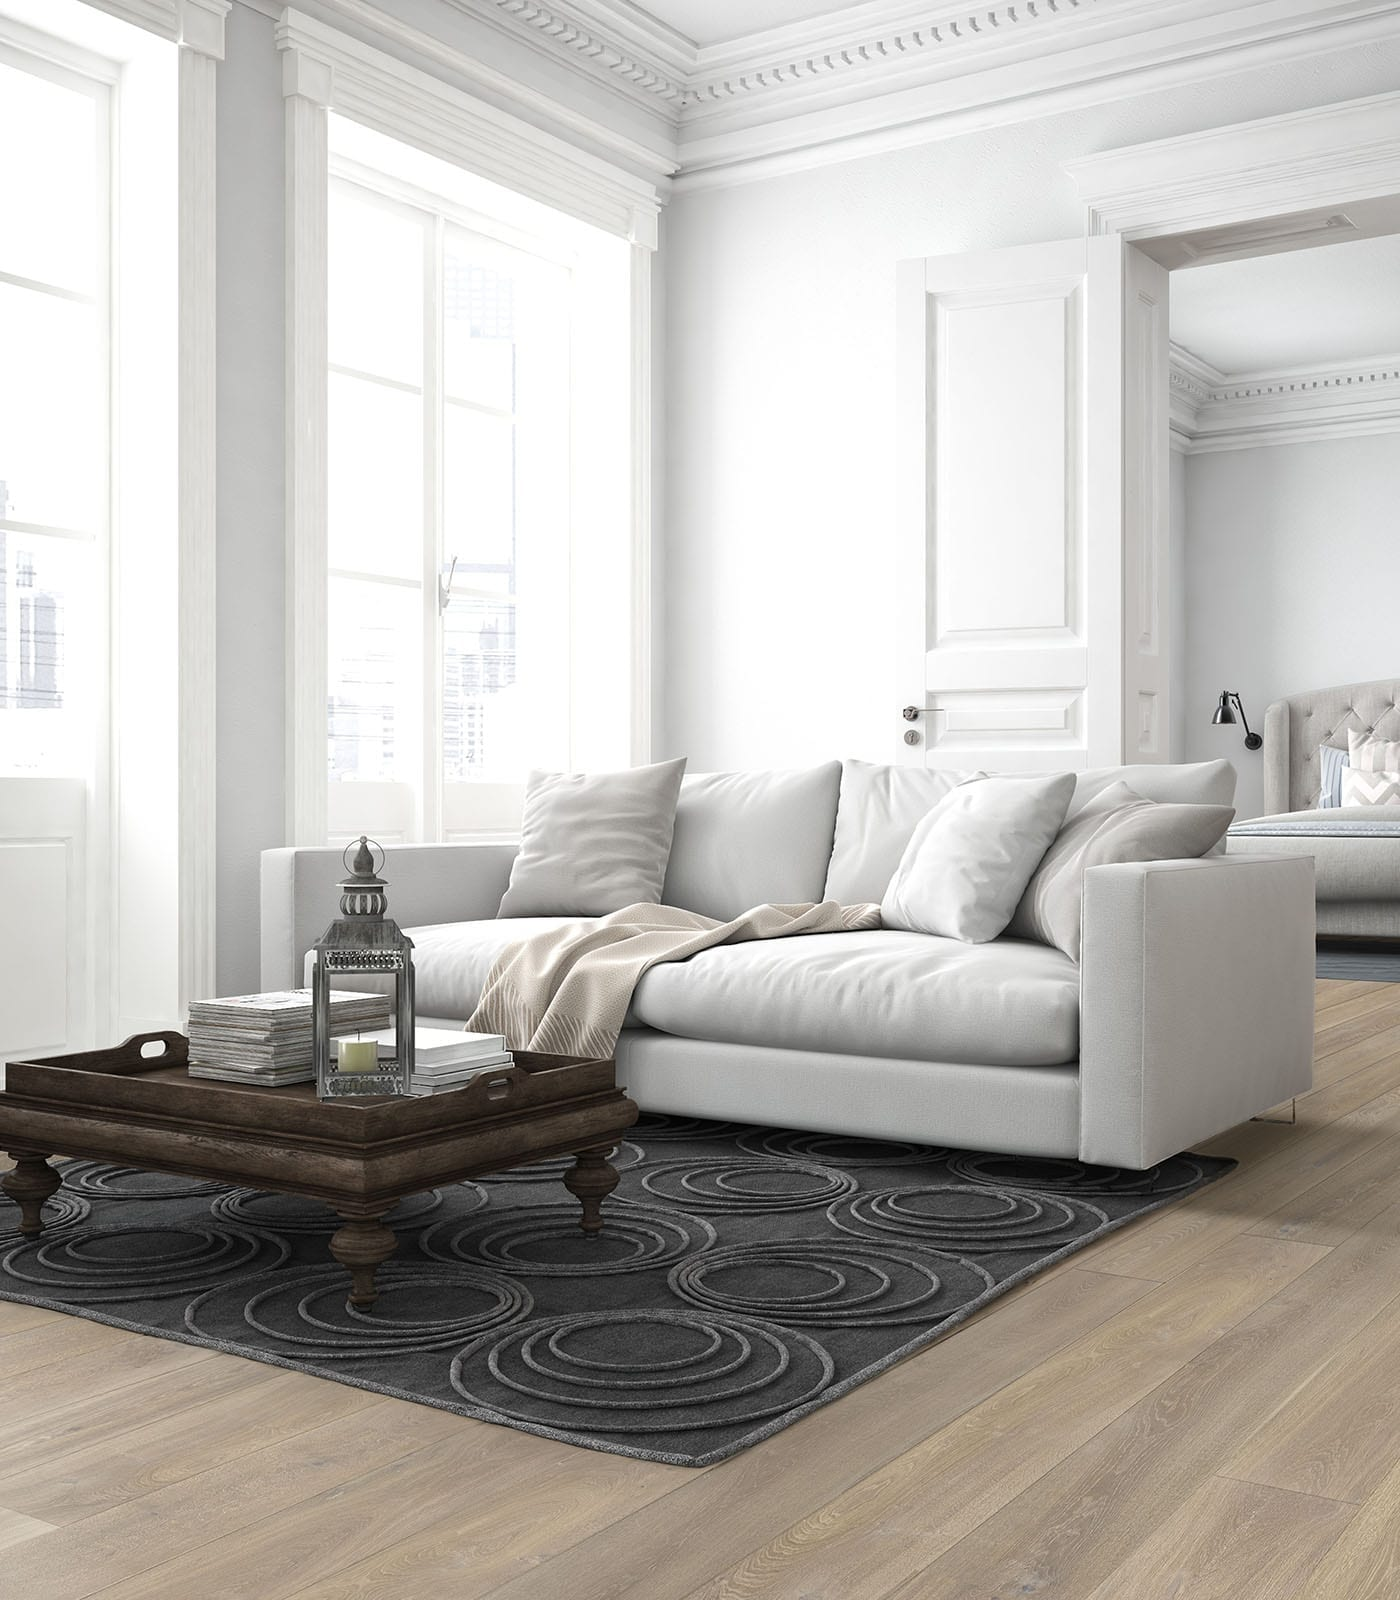 Formentera-European Oak Floors-Lifestyle Collection-room